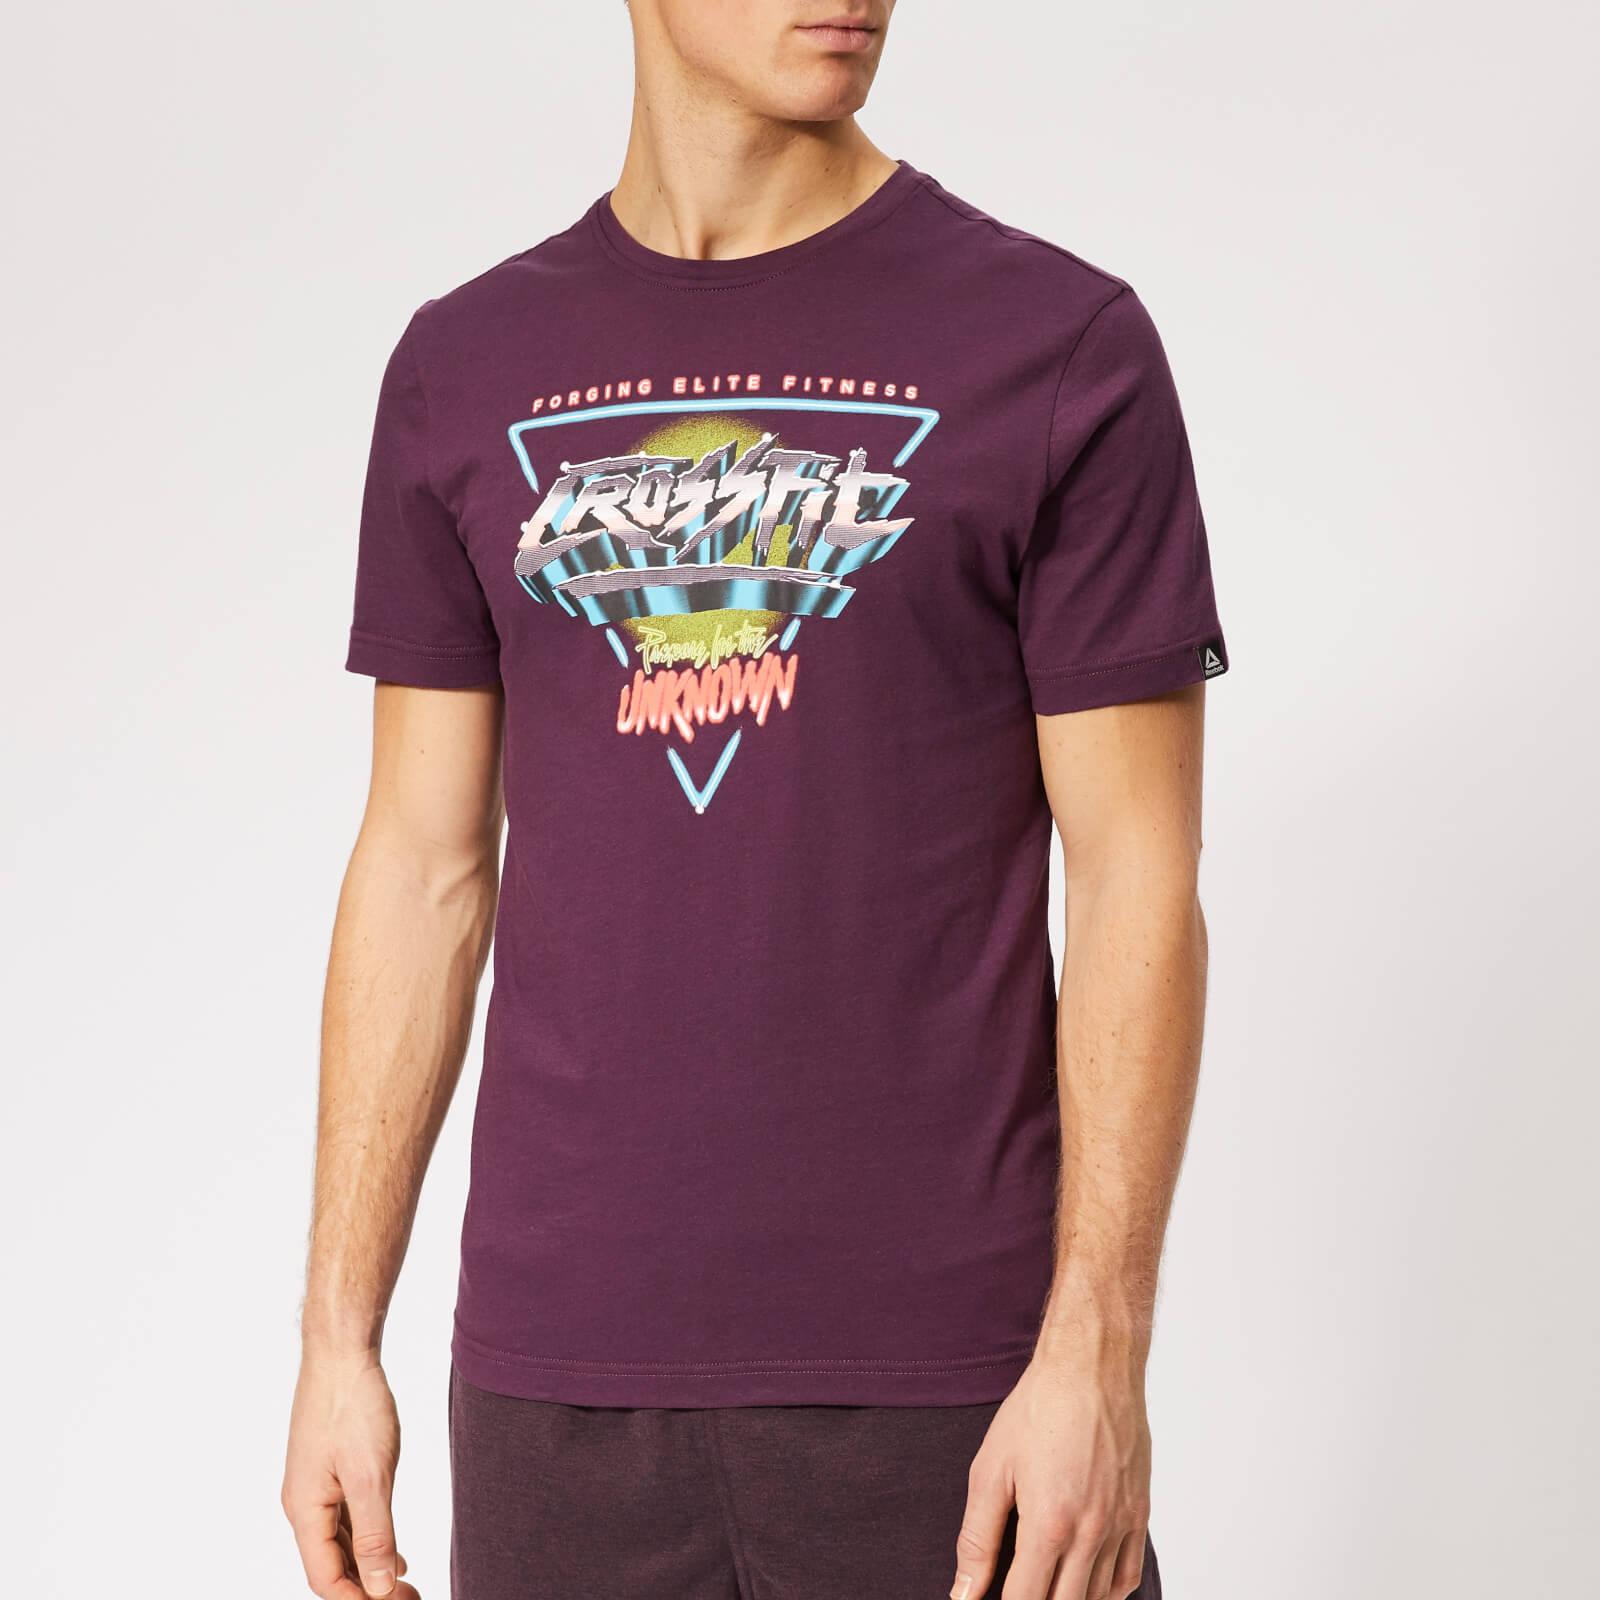 Reebok Men's Crossfit Neon Retro Short Sleeve T-Shirt - Purple - L - Purple